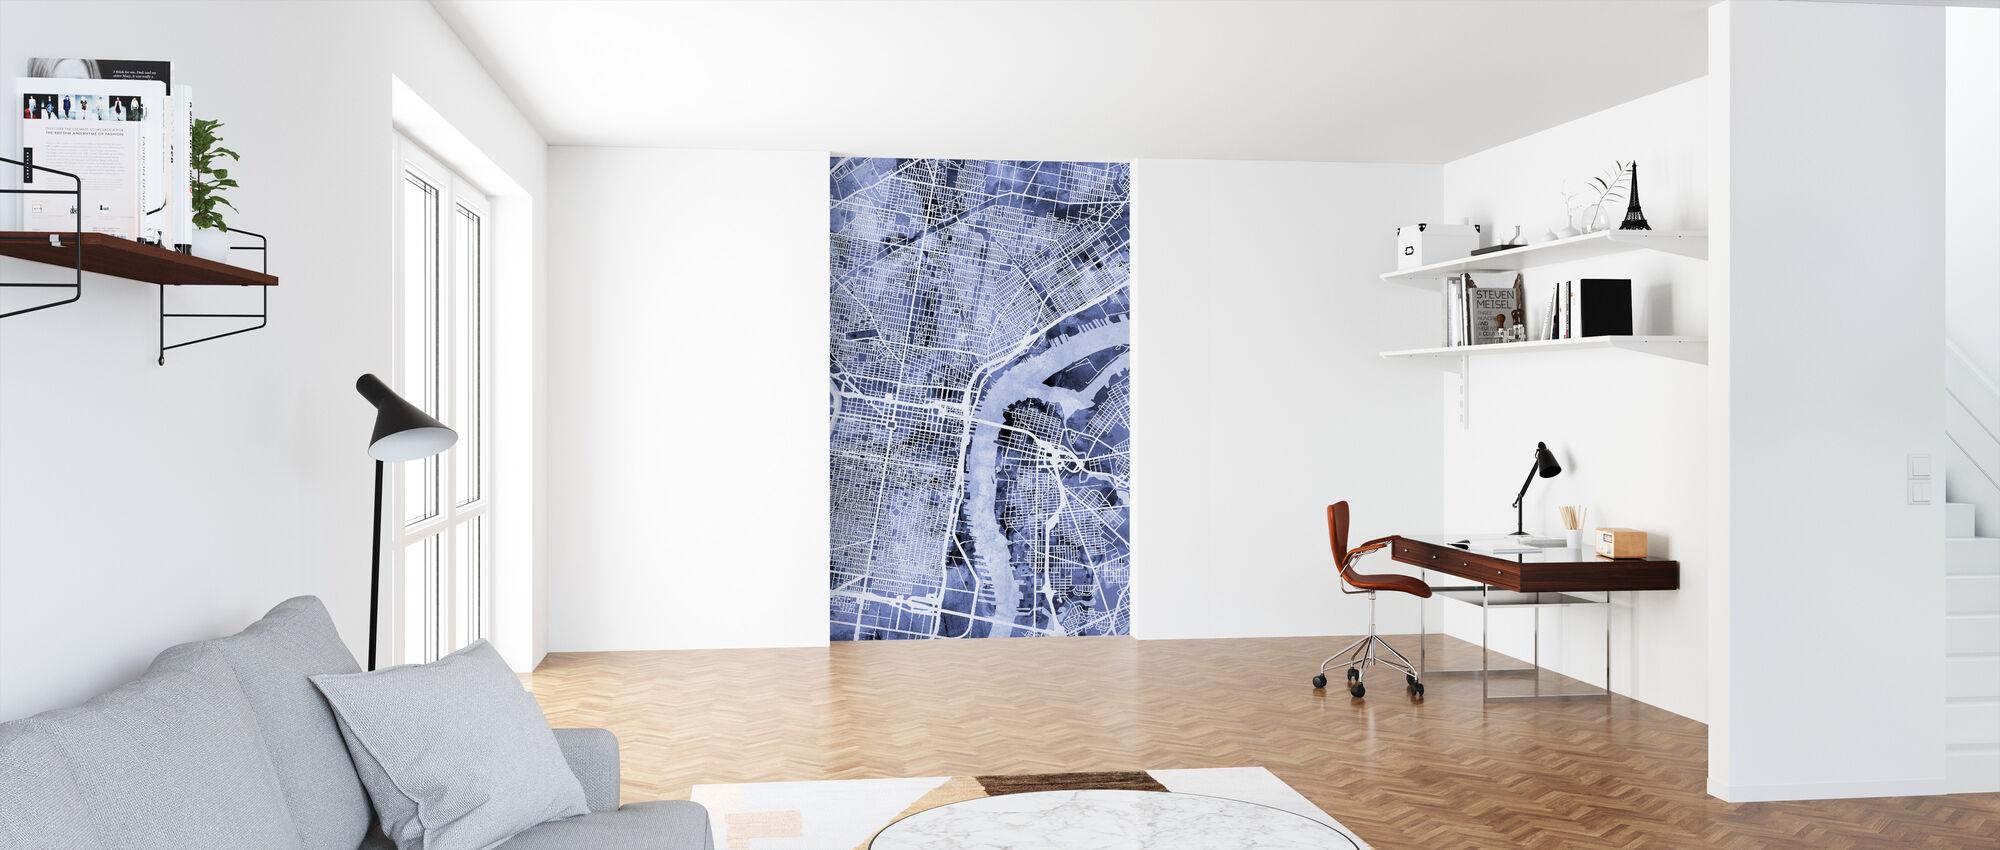 Philadelphia Pennsylvania City Street Map - Wallpaper - Office